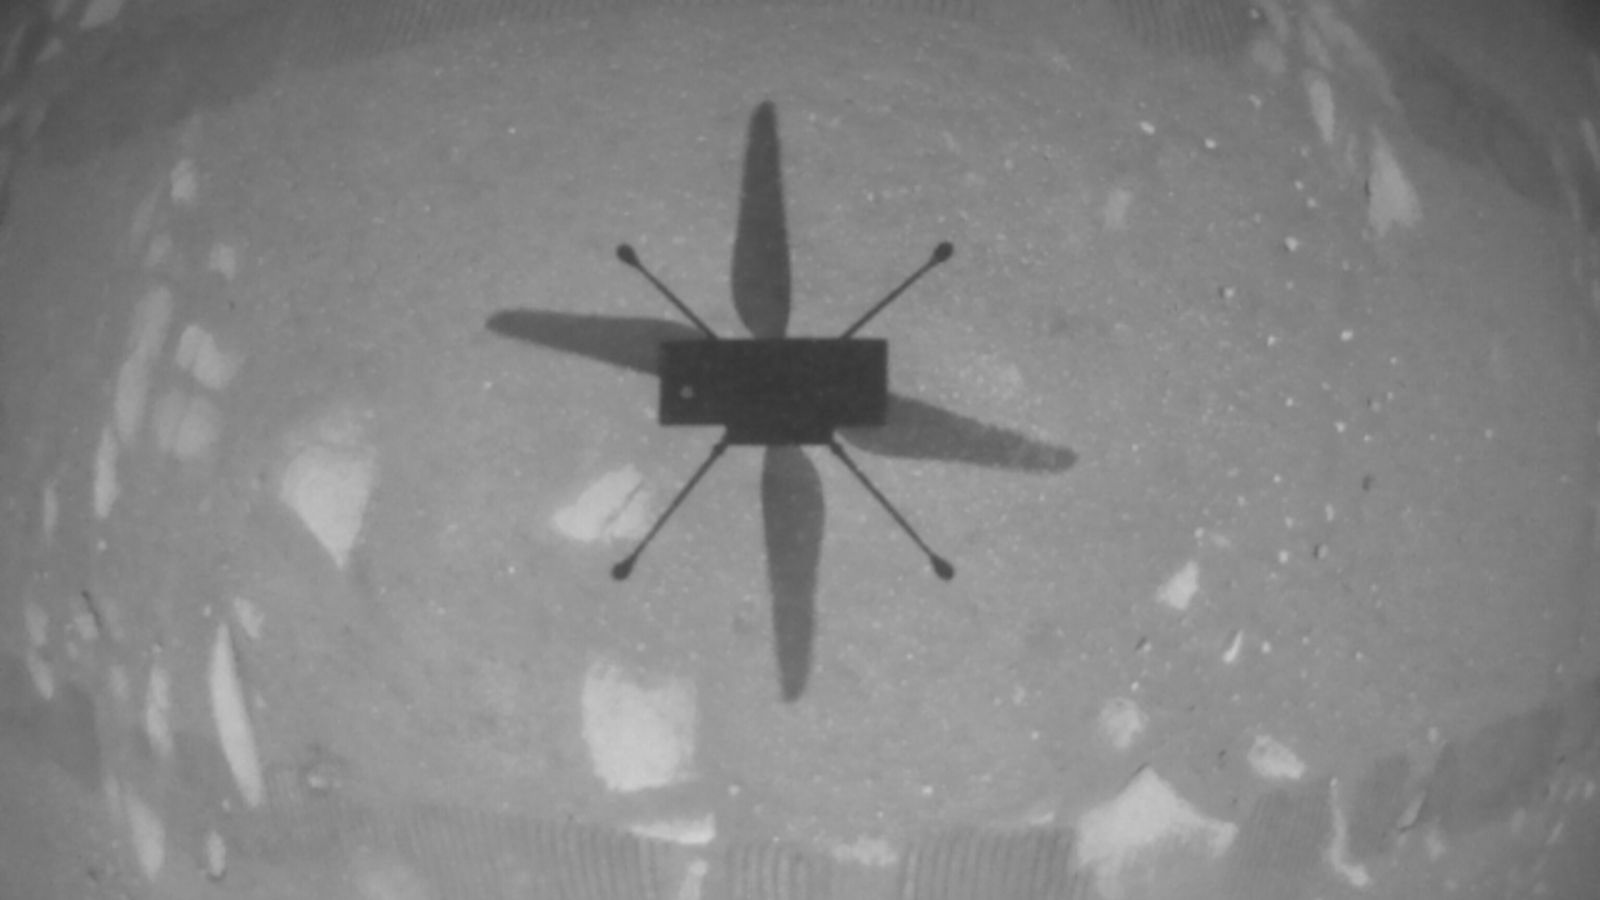 El helicóptero Ingenuity